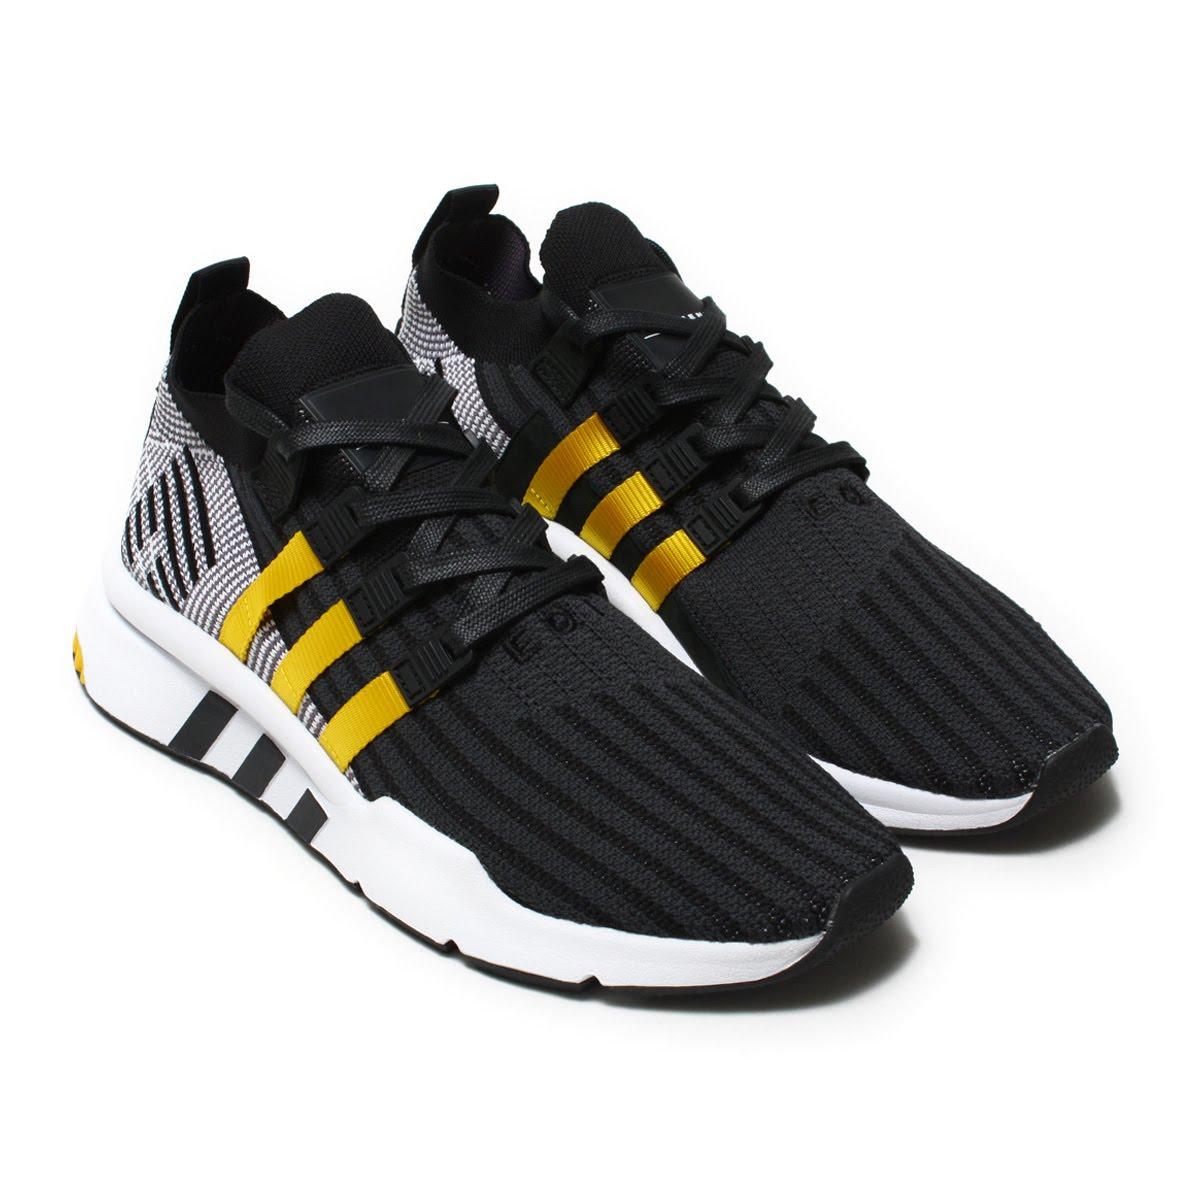 cq2999 adidas Sale   Deals on Shoes